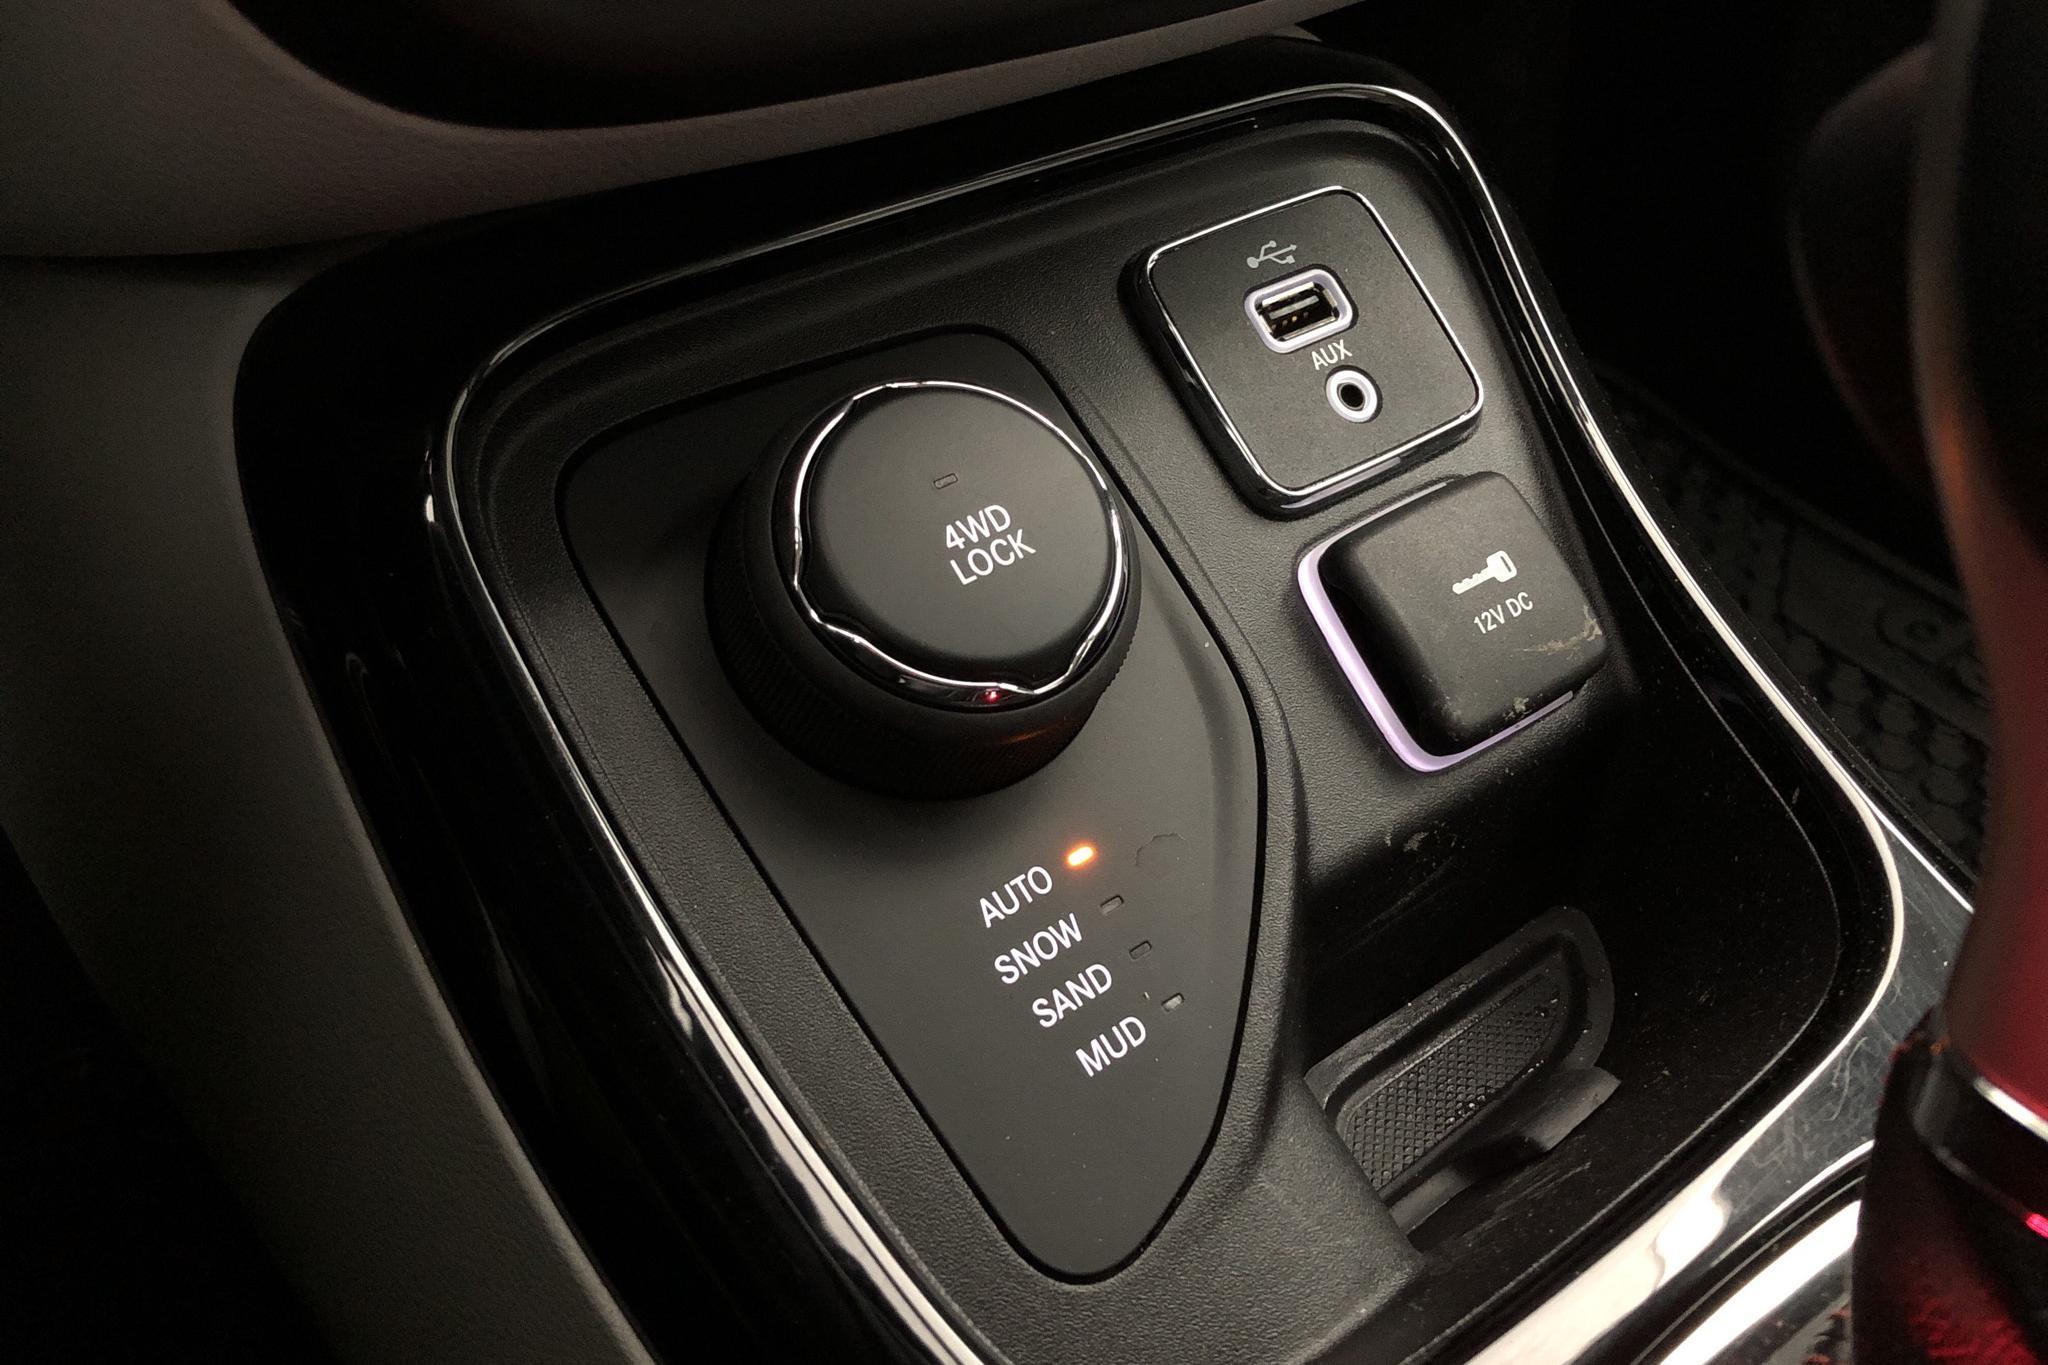 Jeep Compass 2.0 Multijet 4WD (170hk) - 37 160 km - Automatic - gray - 2018